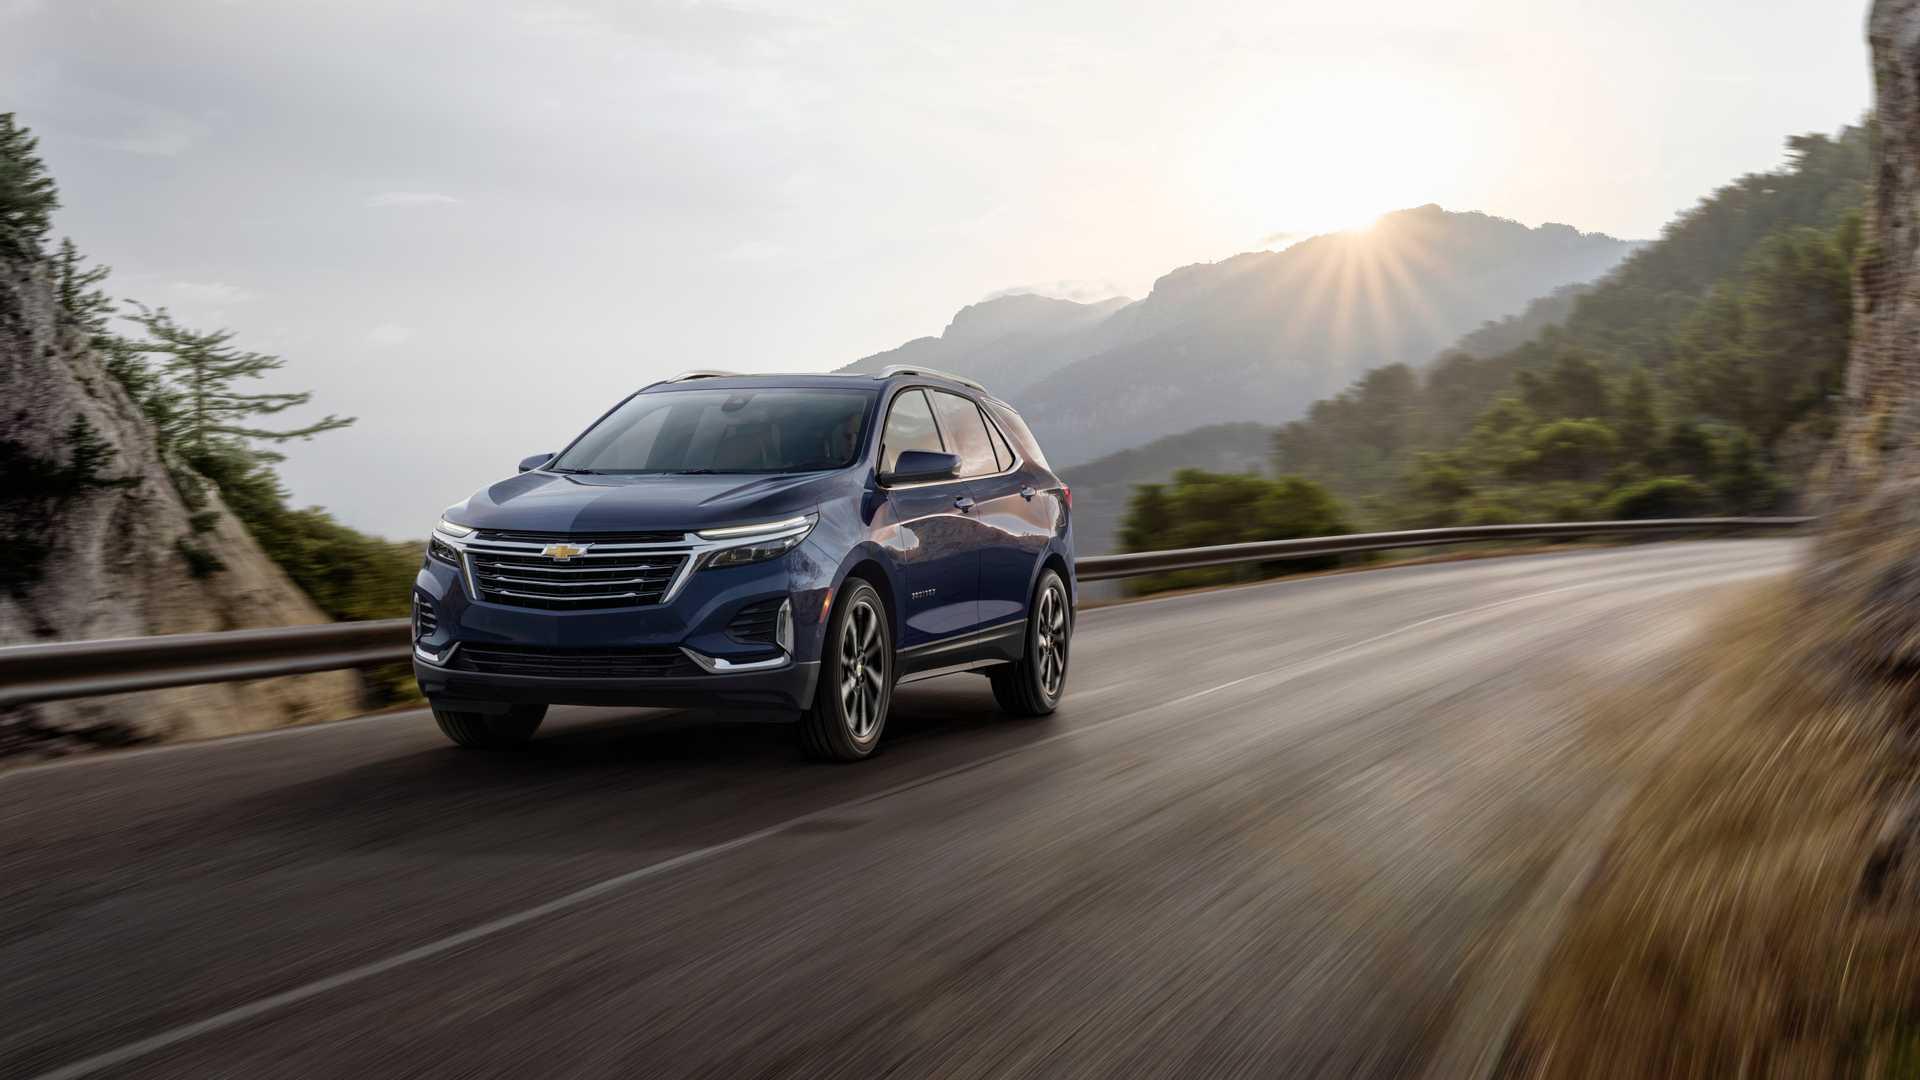 2021 Chevrolet Equinox Premier Front Three-Quarter Wallpapers (1)